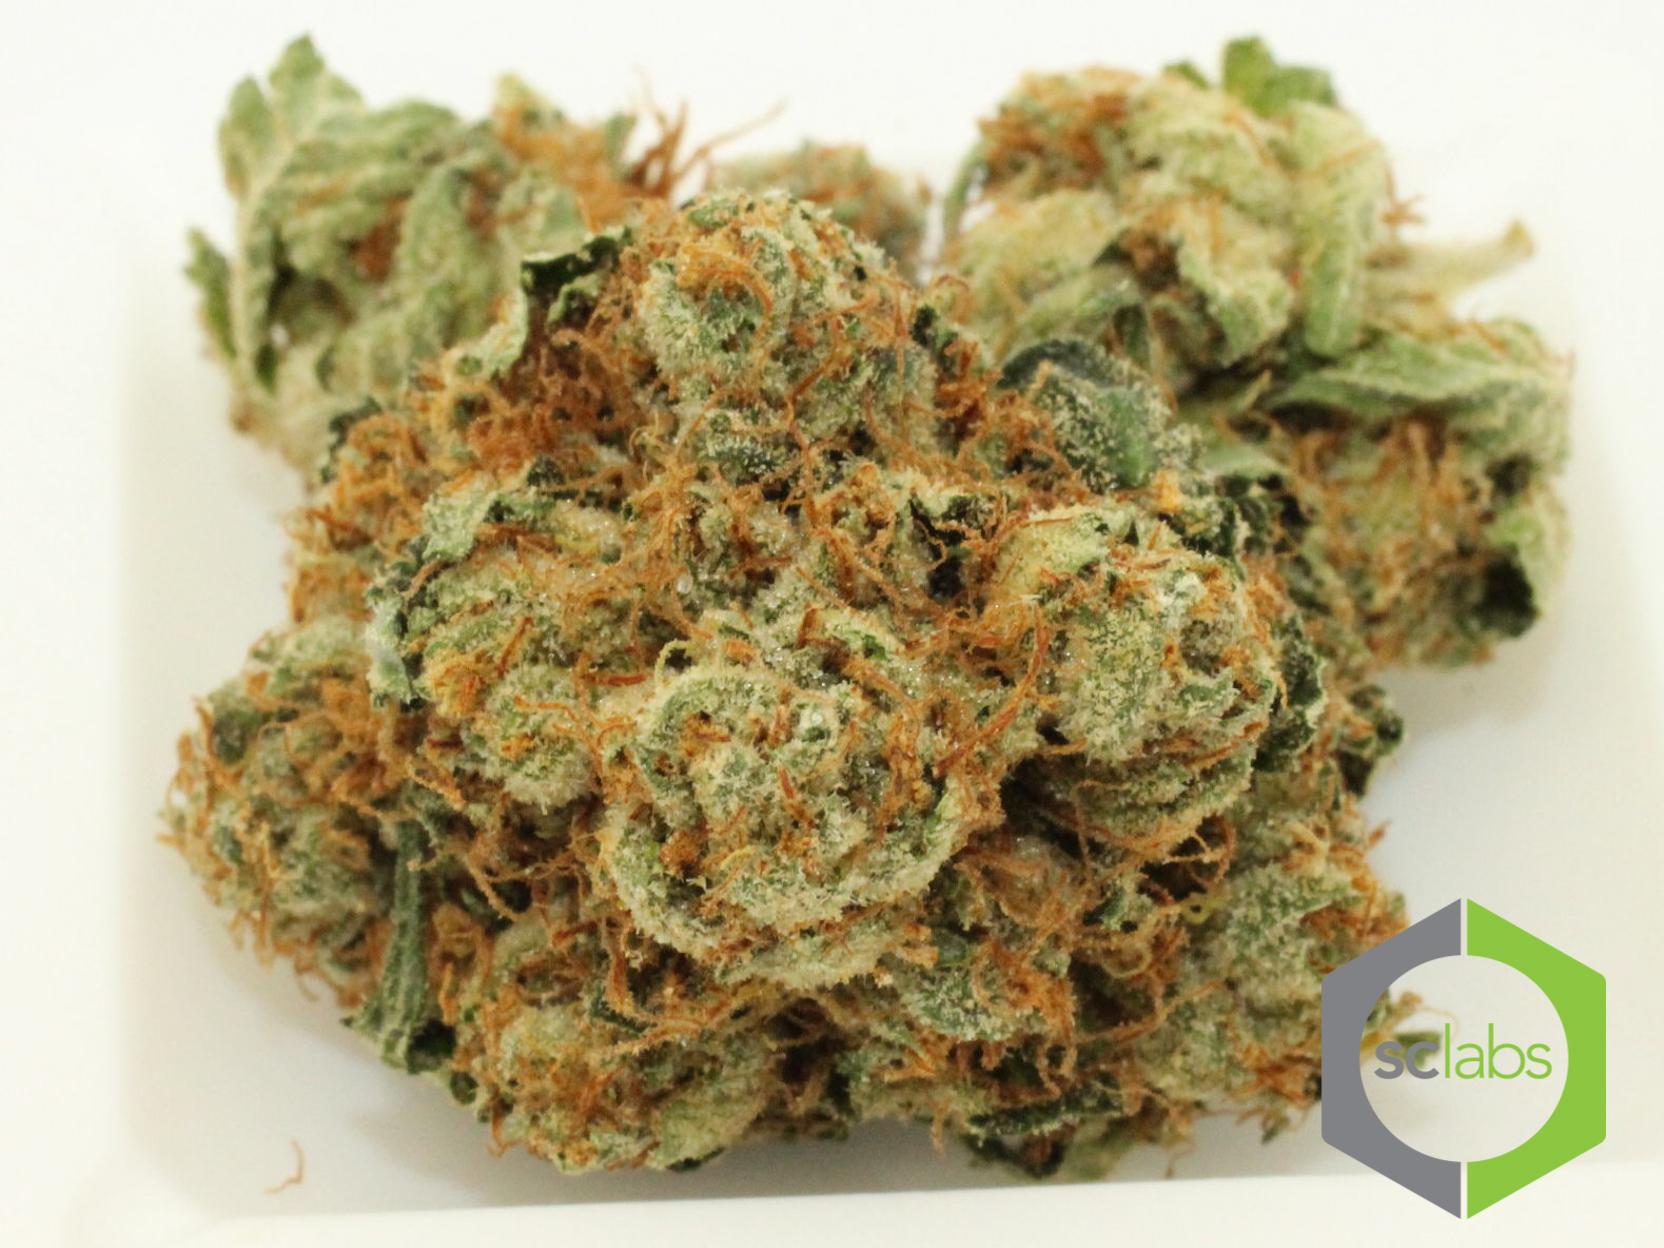 quiver-og-cannabis